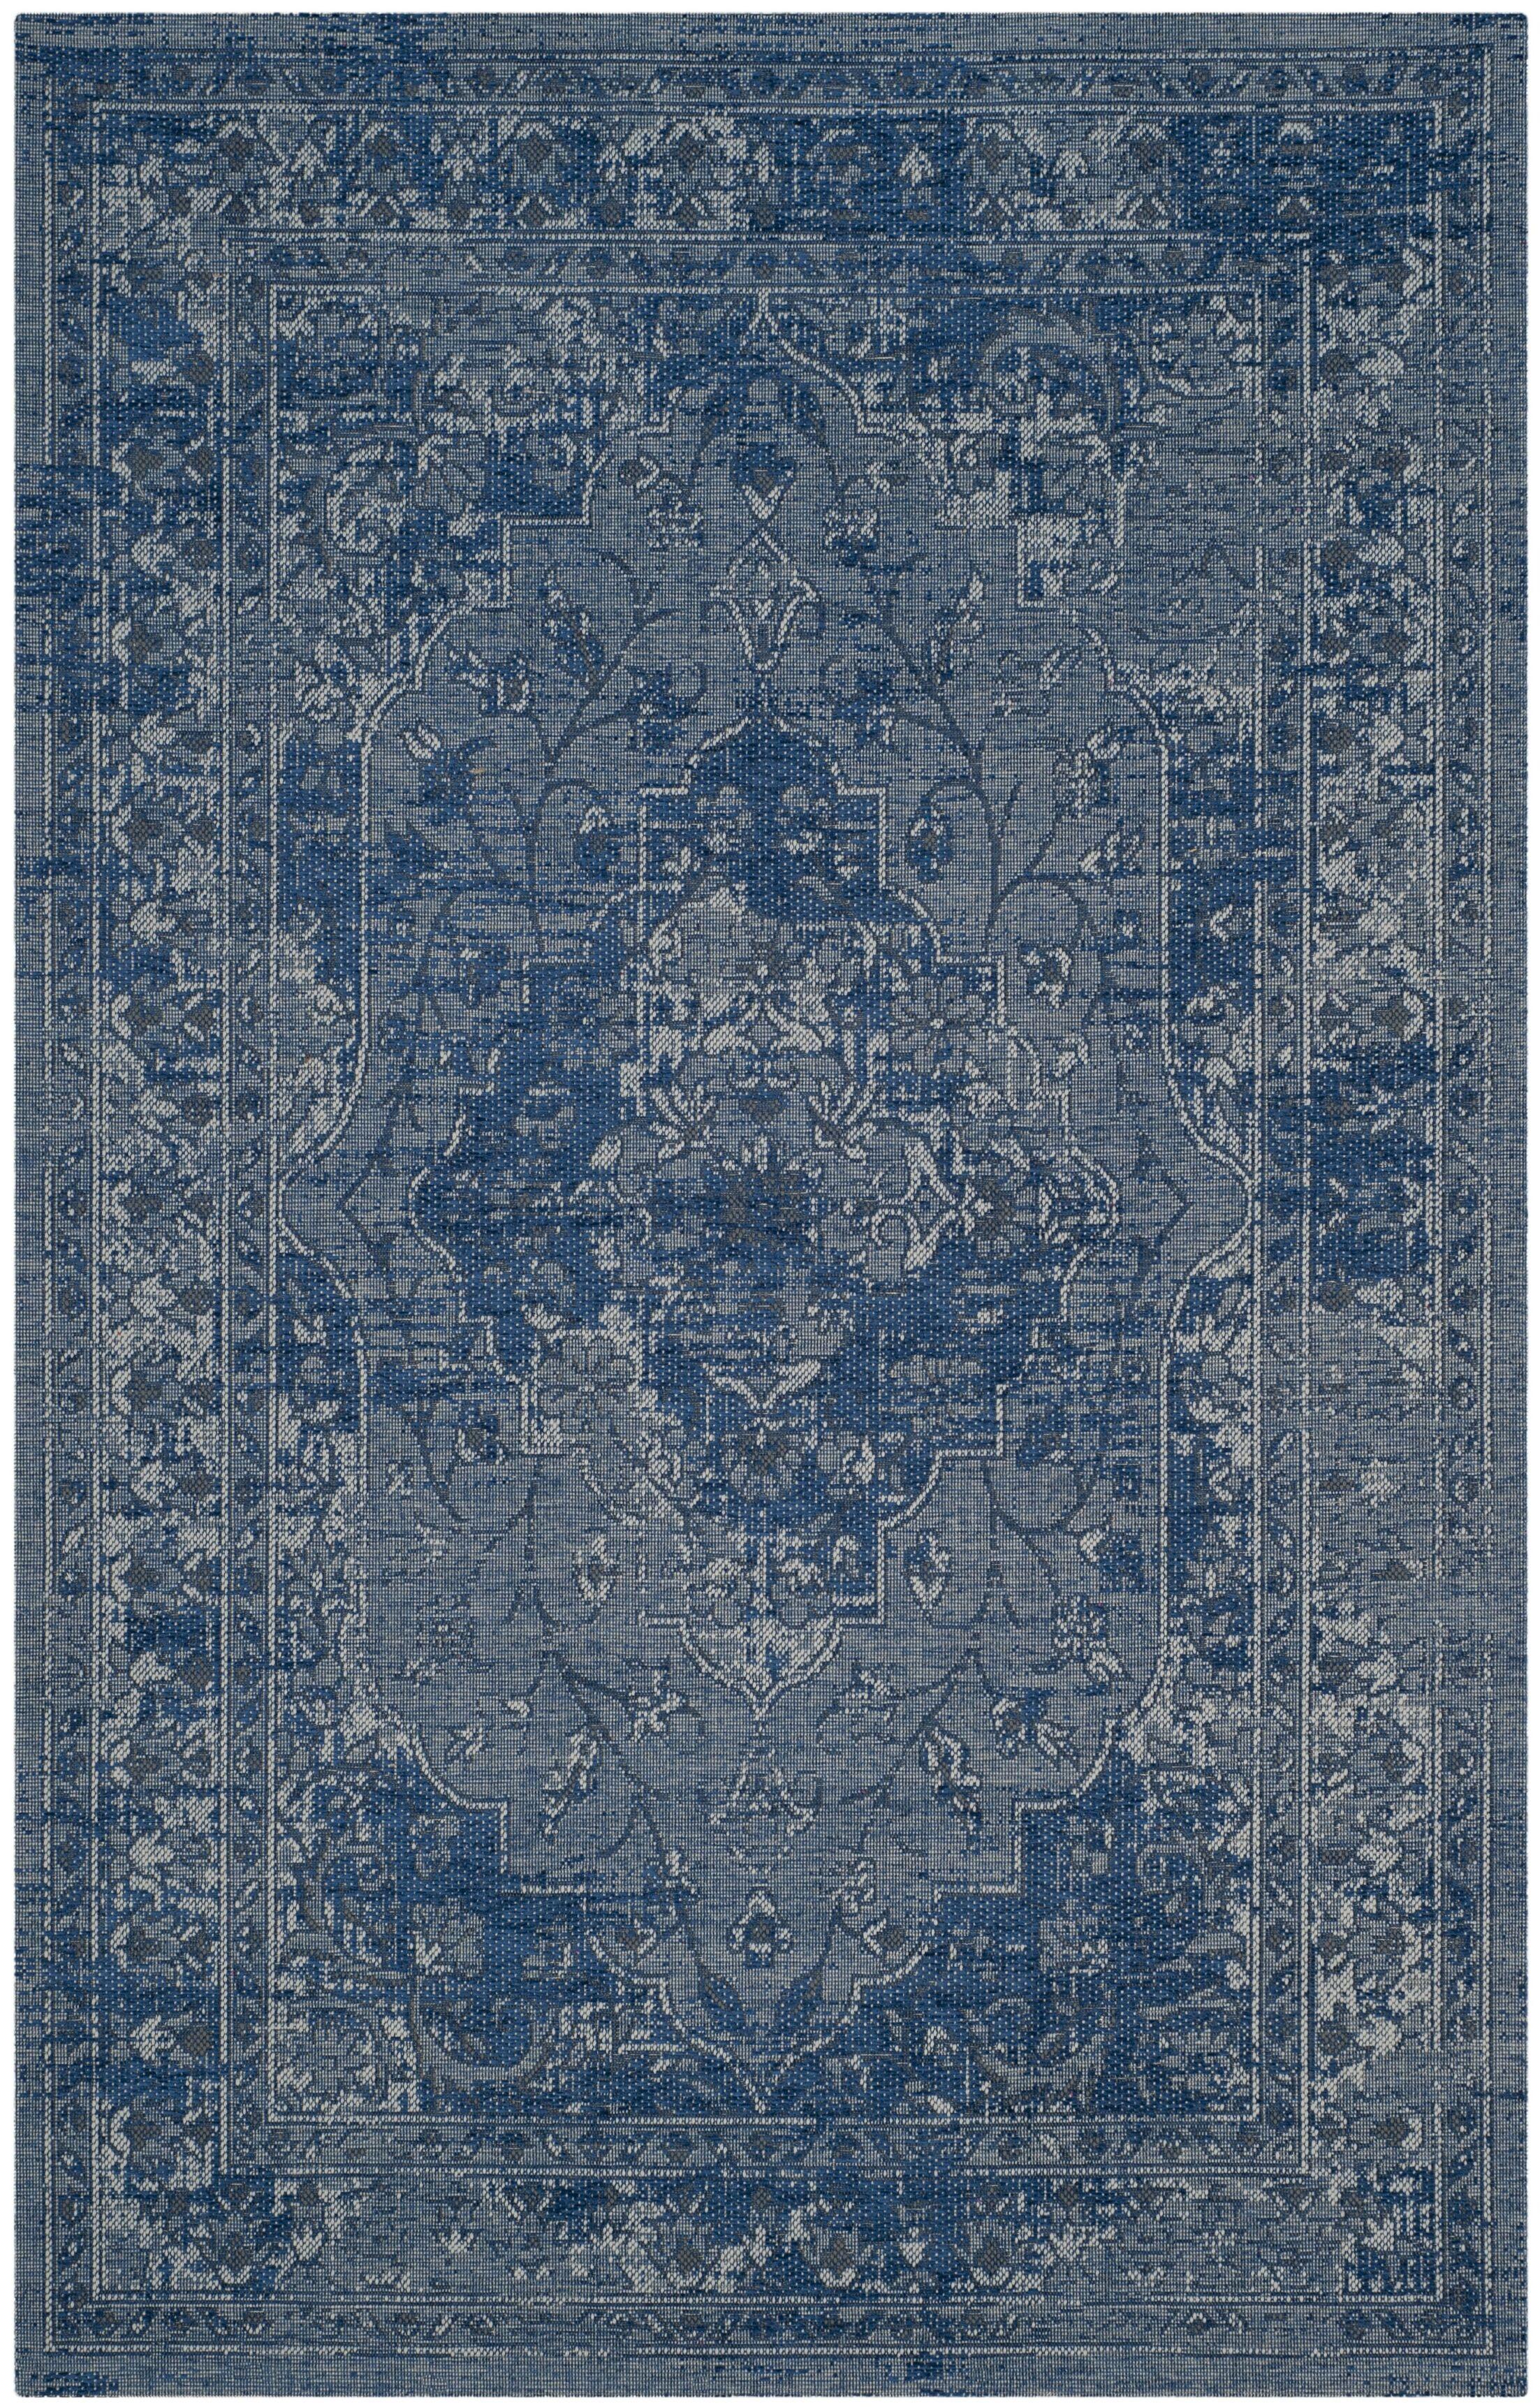 Port Laguerre Blue/Light Gray Area Rug Rug Size: Rectangle 8' x 11'